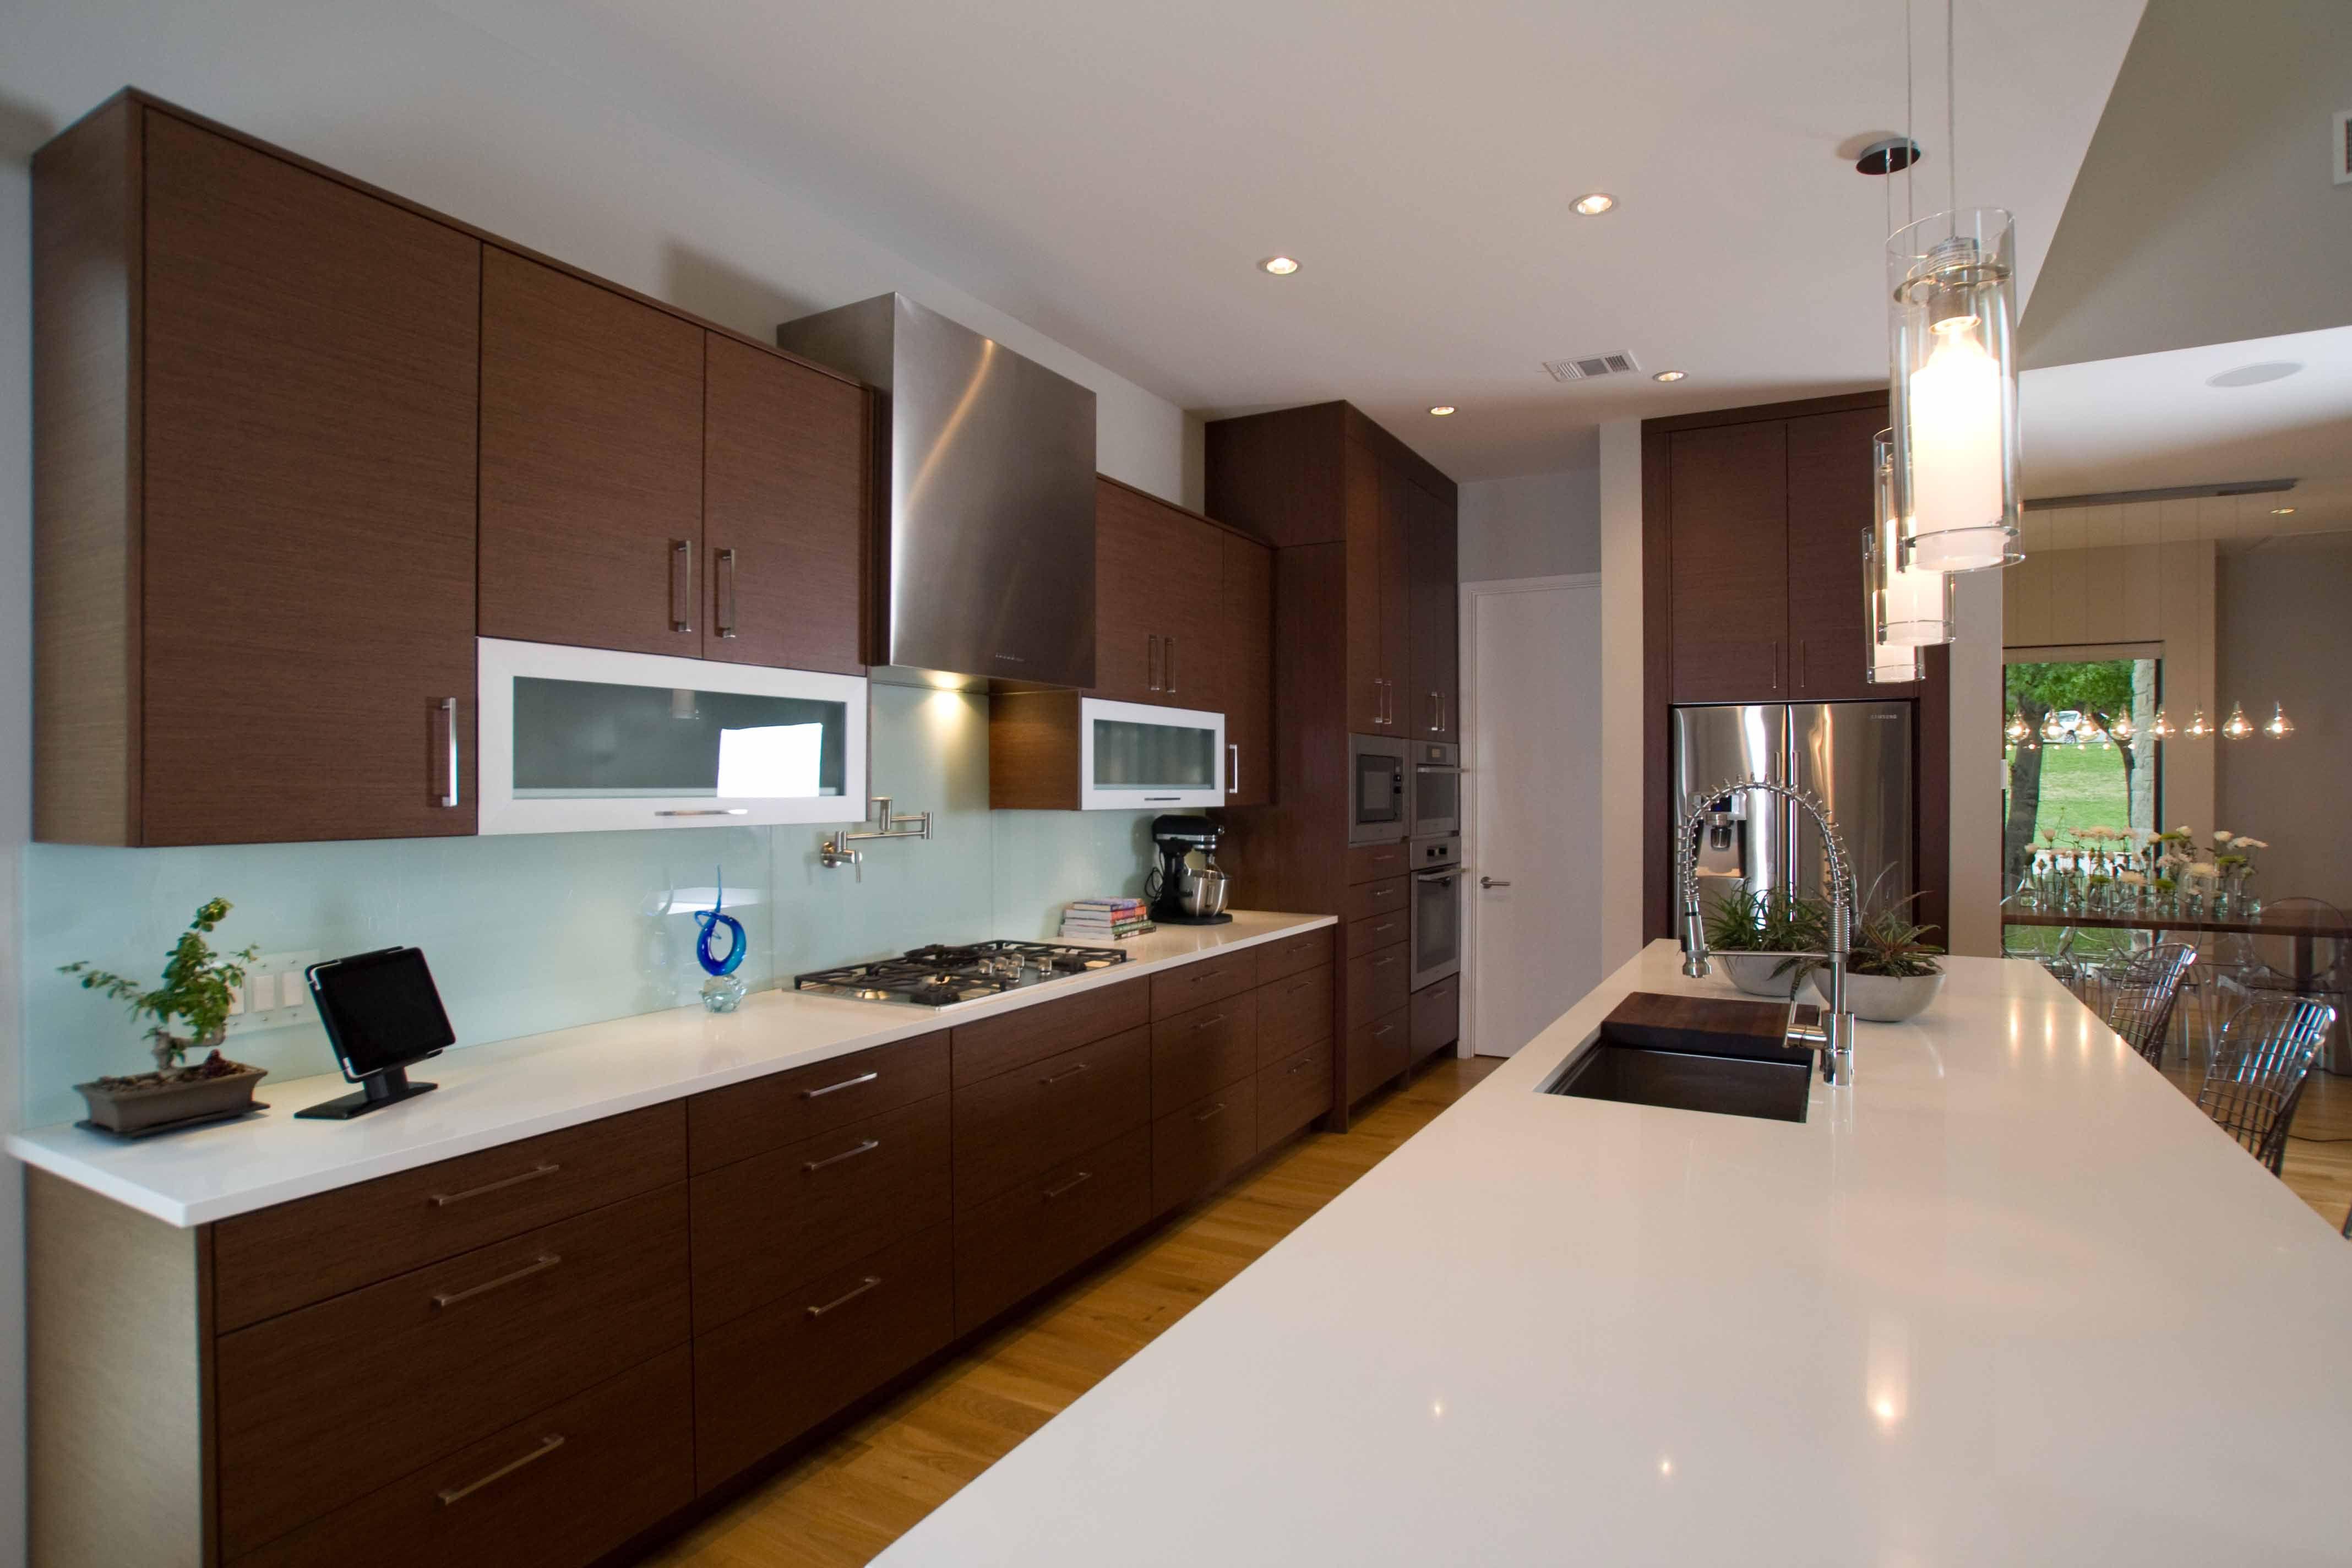 San Leandro Dwelling   Kitchen cabinets, Home decor, Kitchen